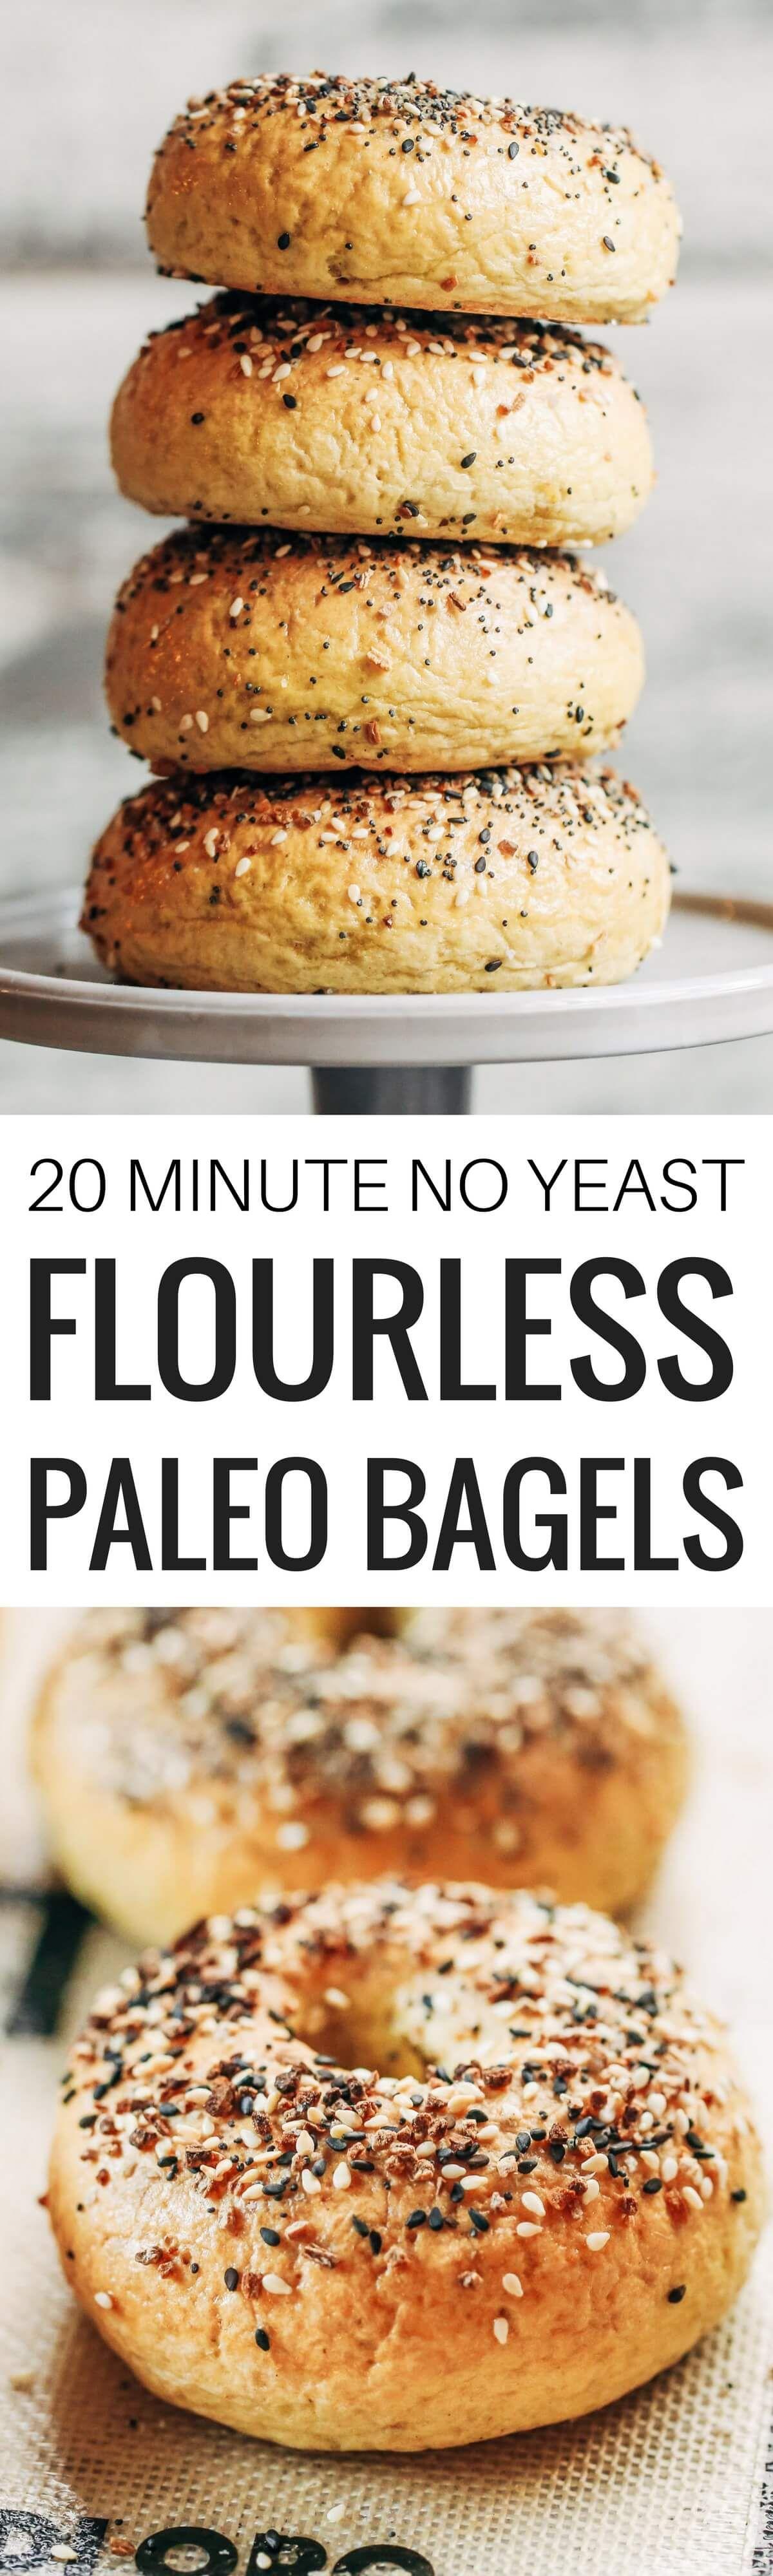 Paleo Bagels Recipe Bagel recipe, Allergy free recipes